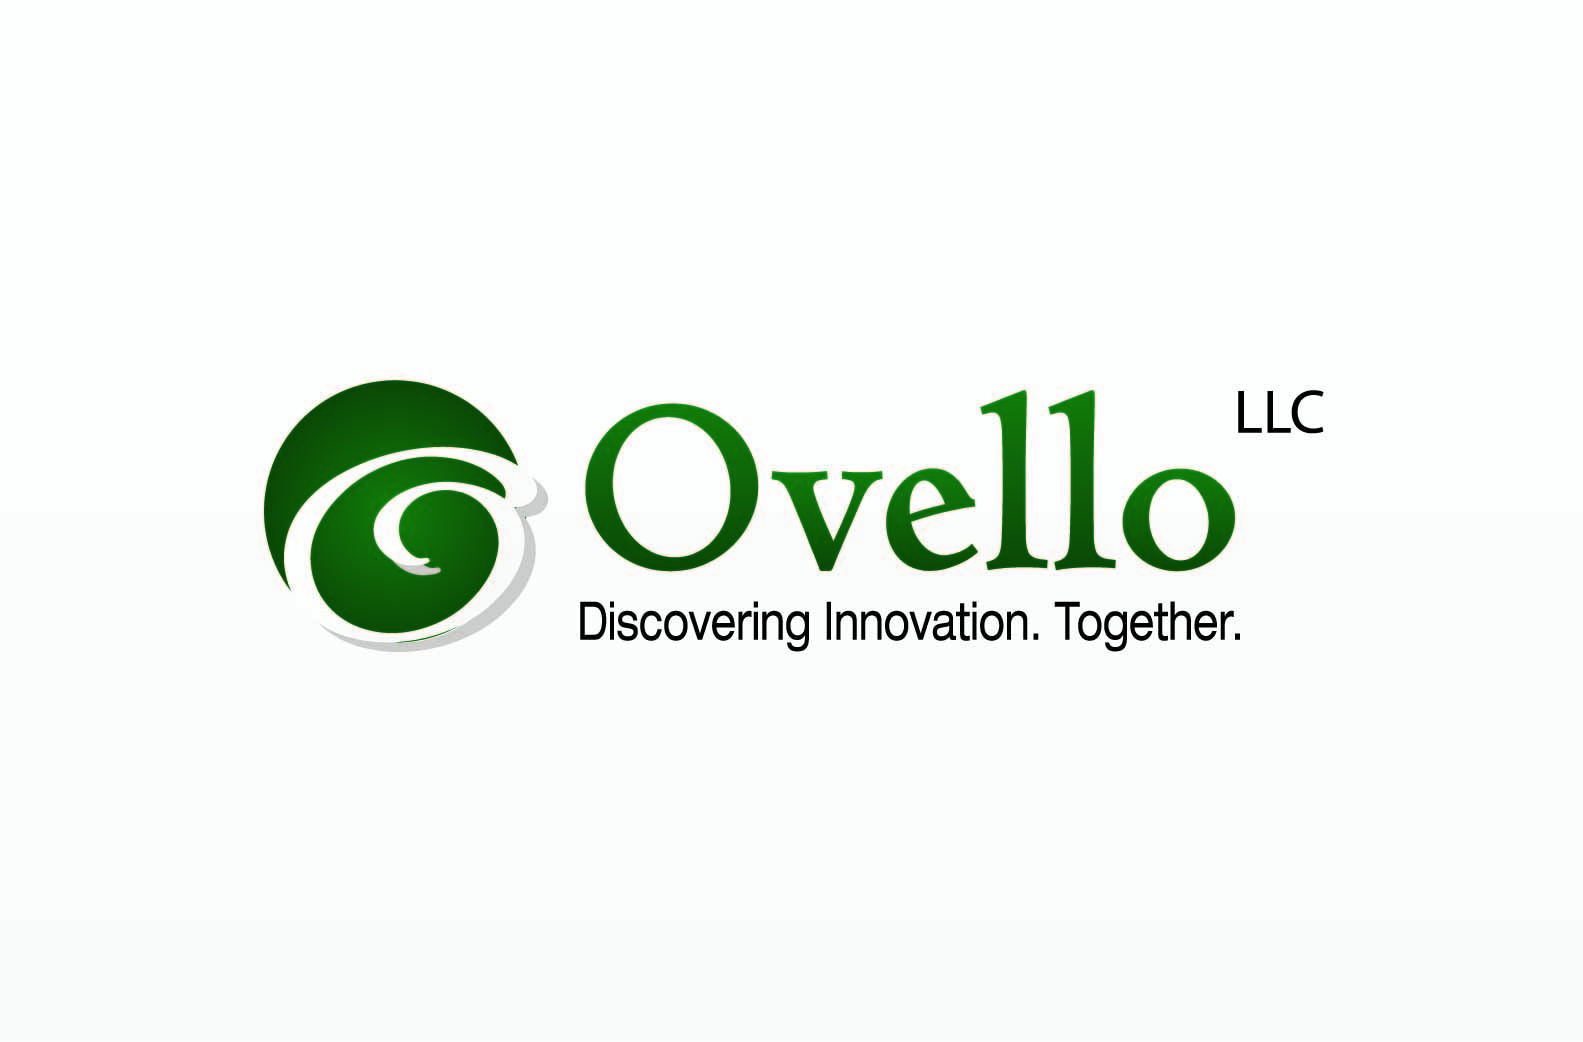 Logo design for ovello llc by onesource creative design for Hispano international decor llc